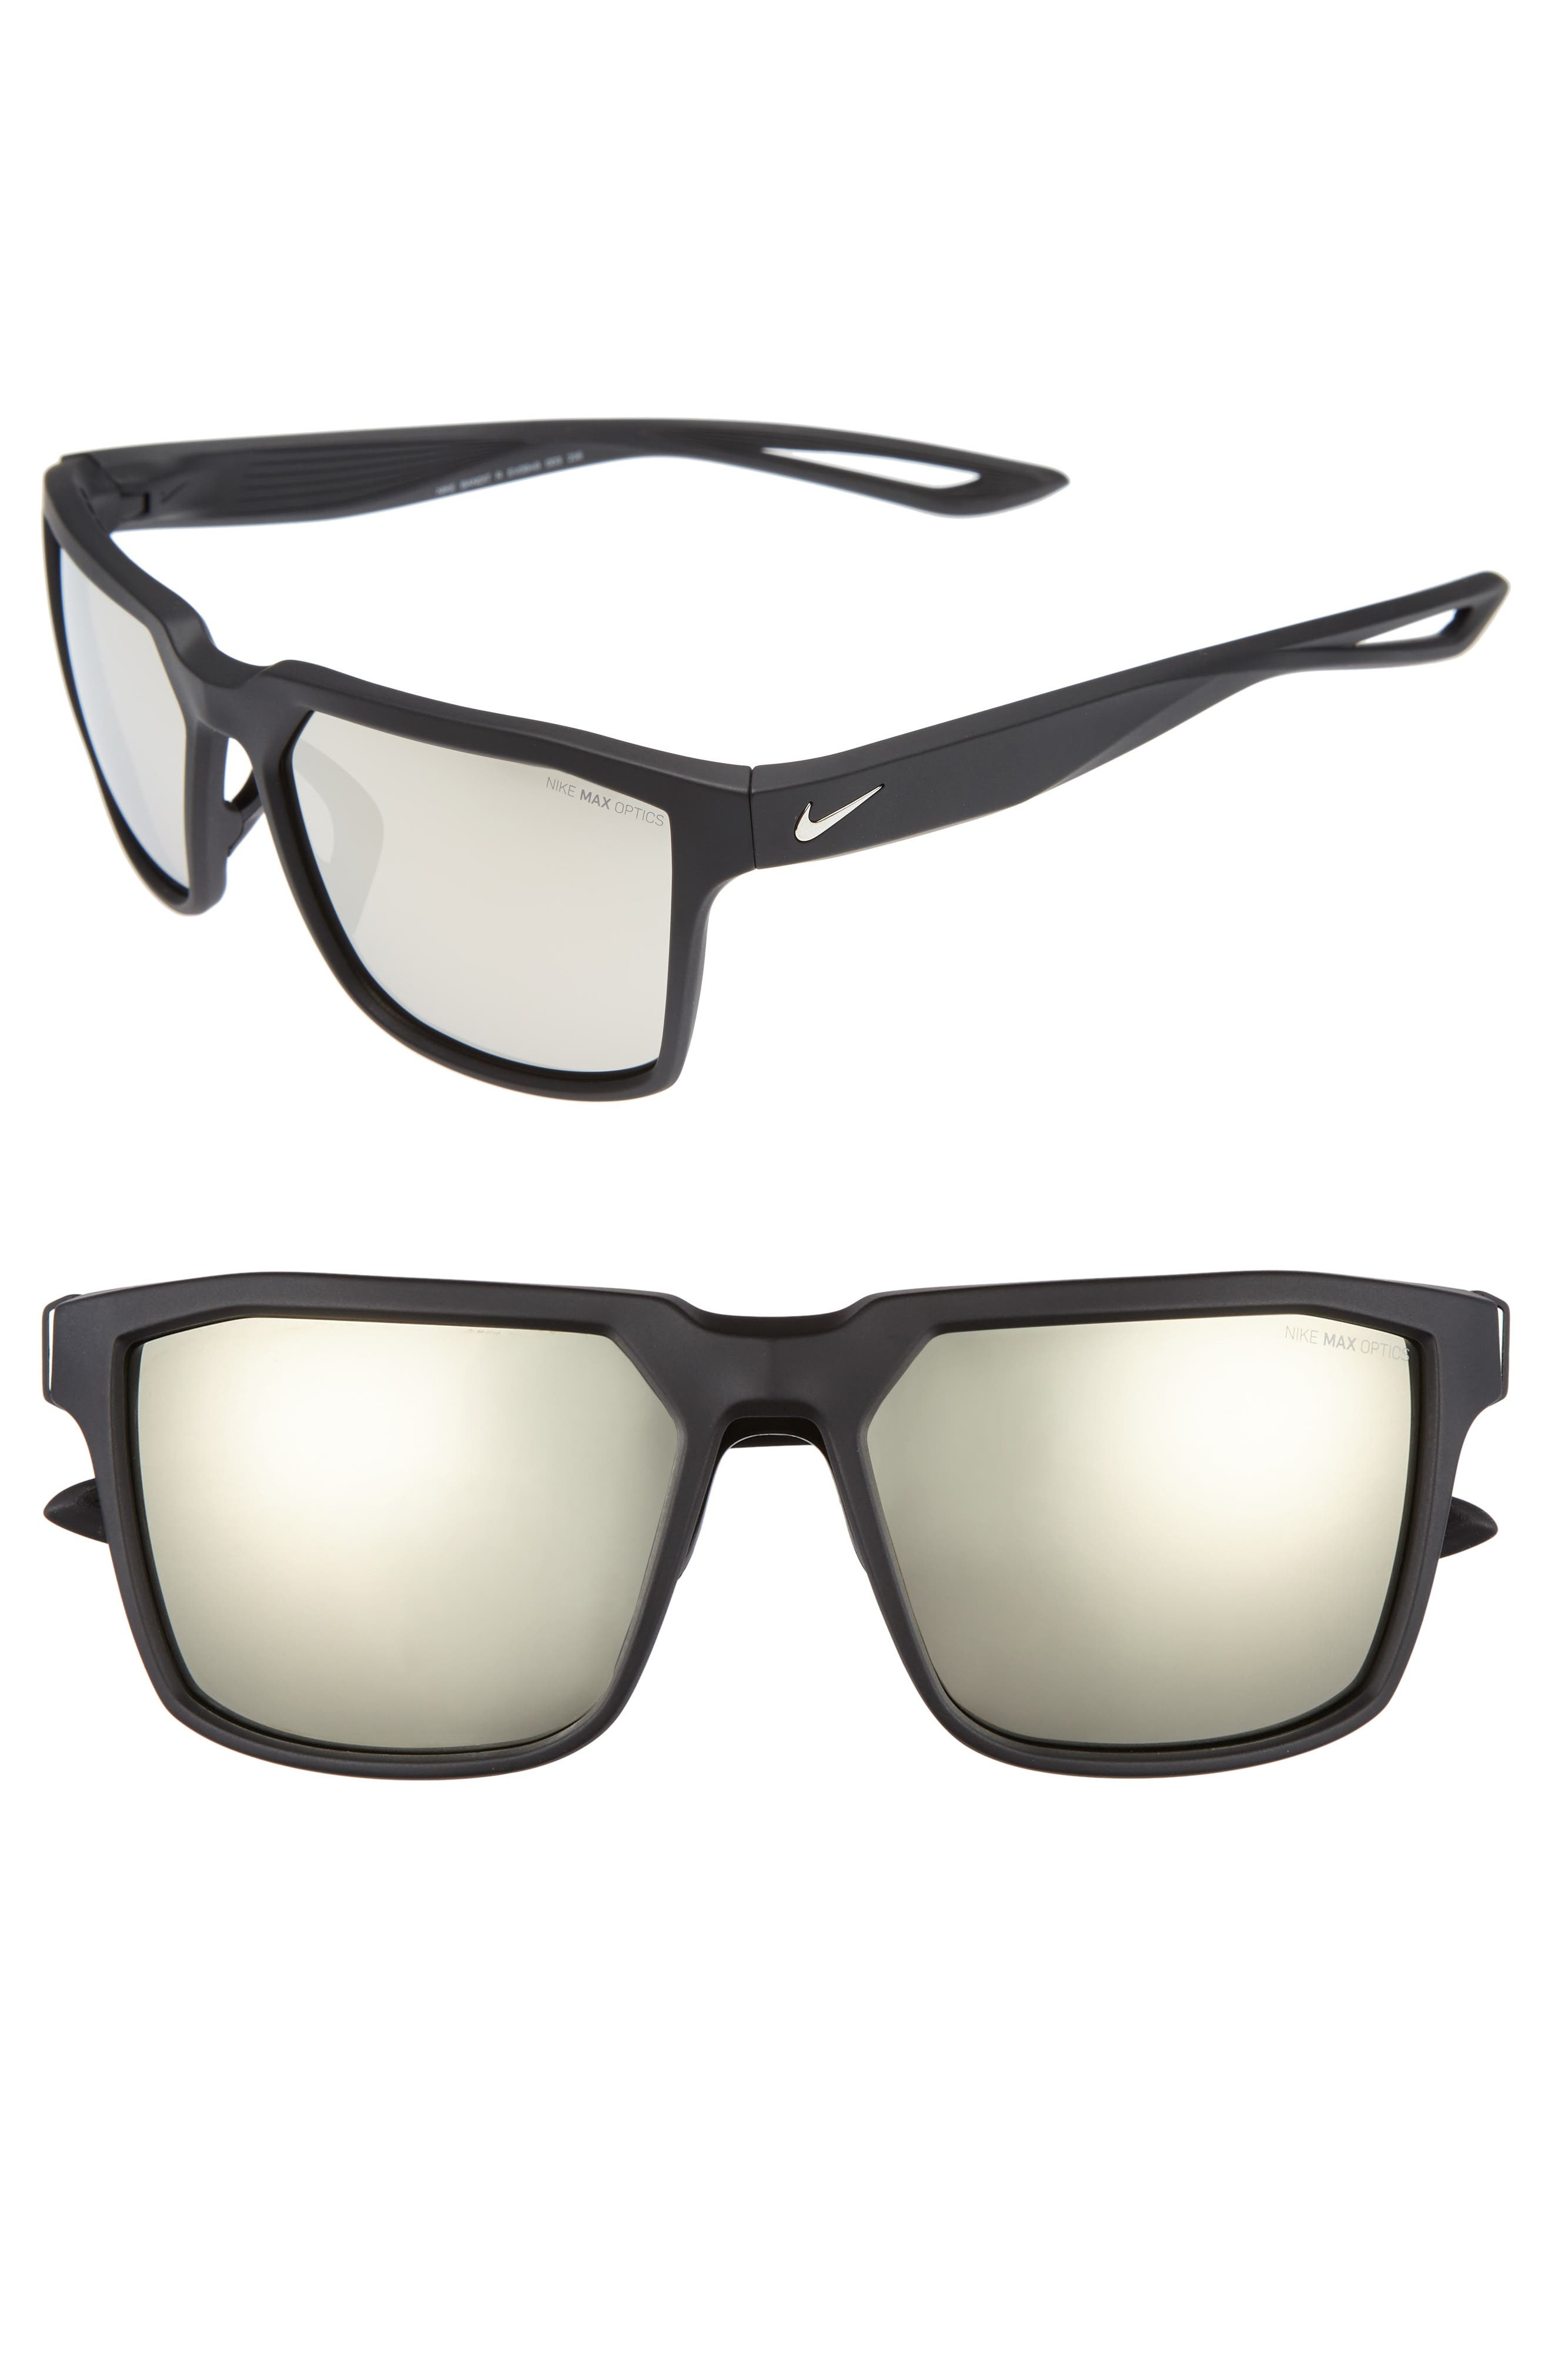 Nike Bandit R 5m Sunglasses - Matte Black/ Silver